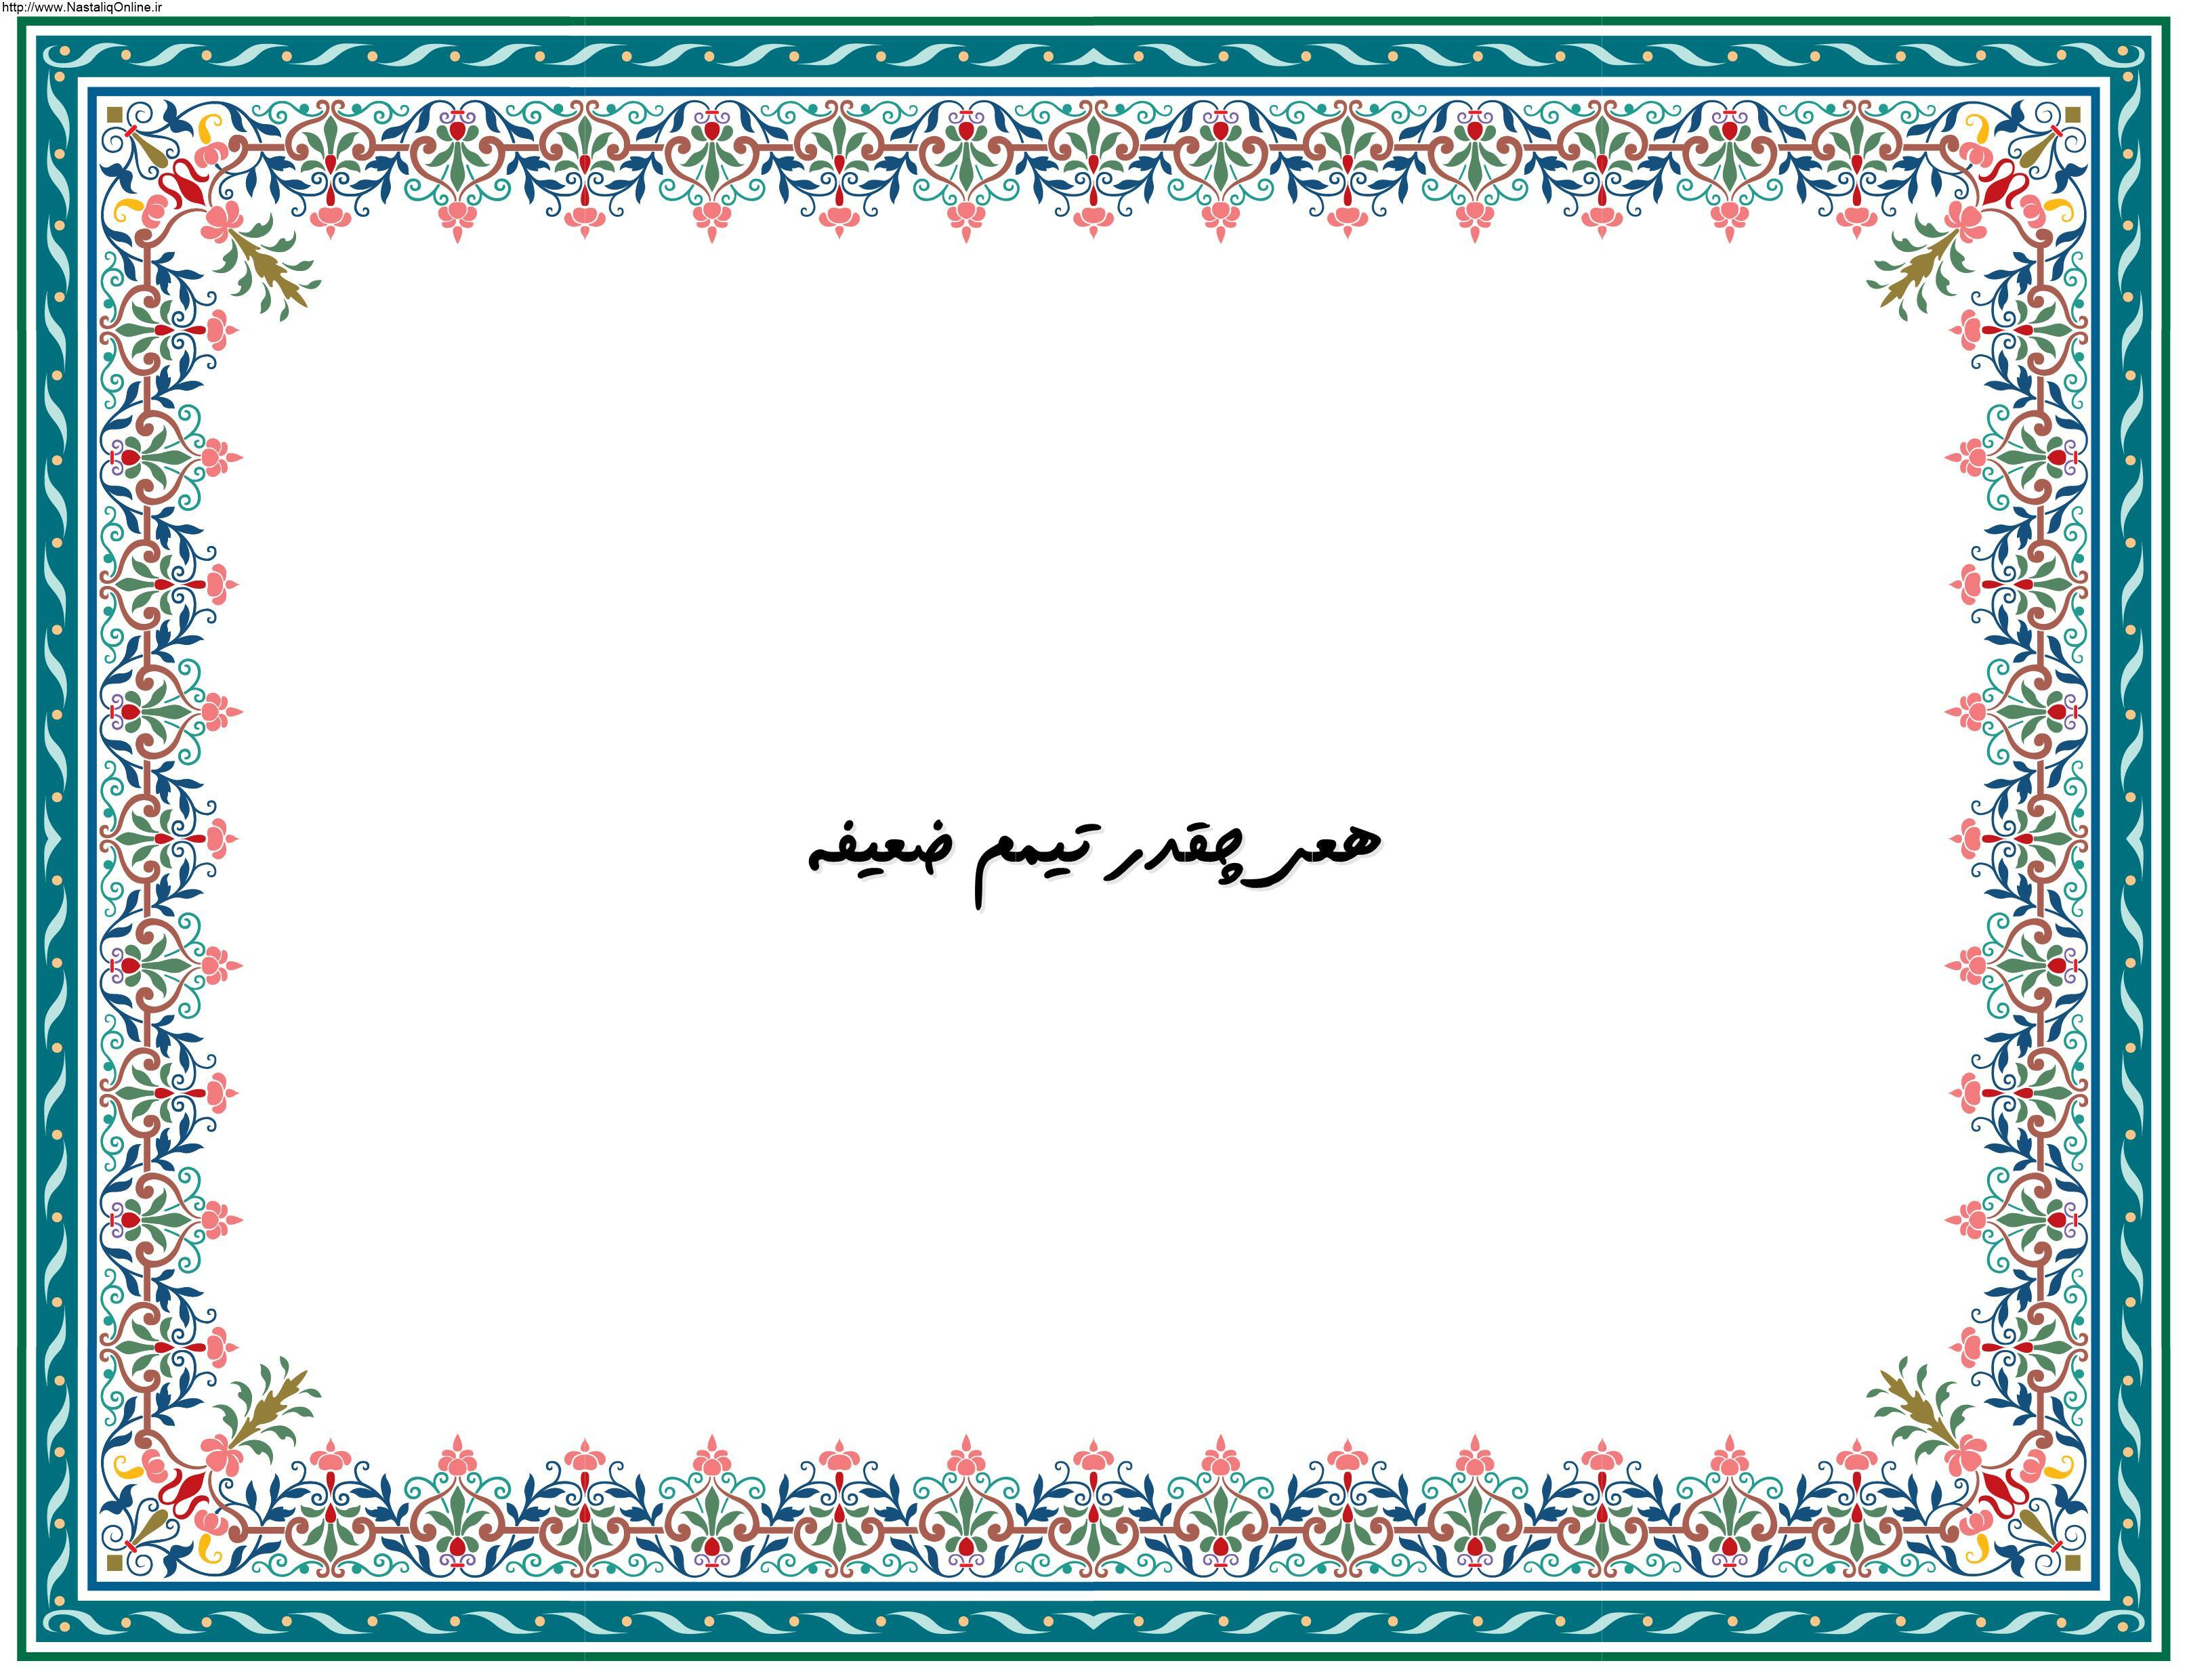 iz11_nastaliqonline.ir-_2_.jpg